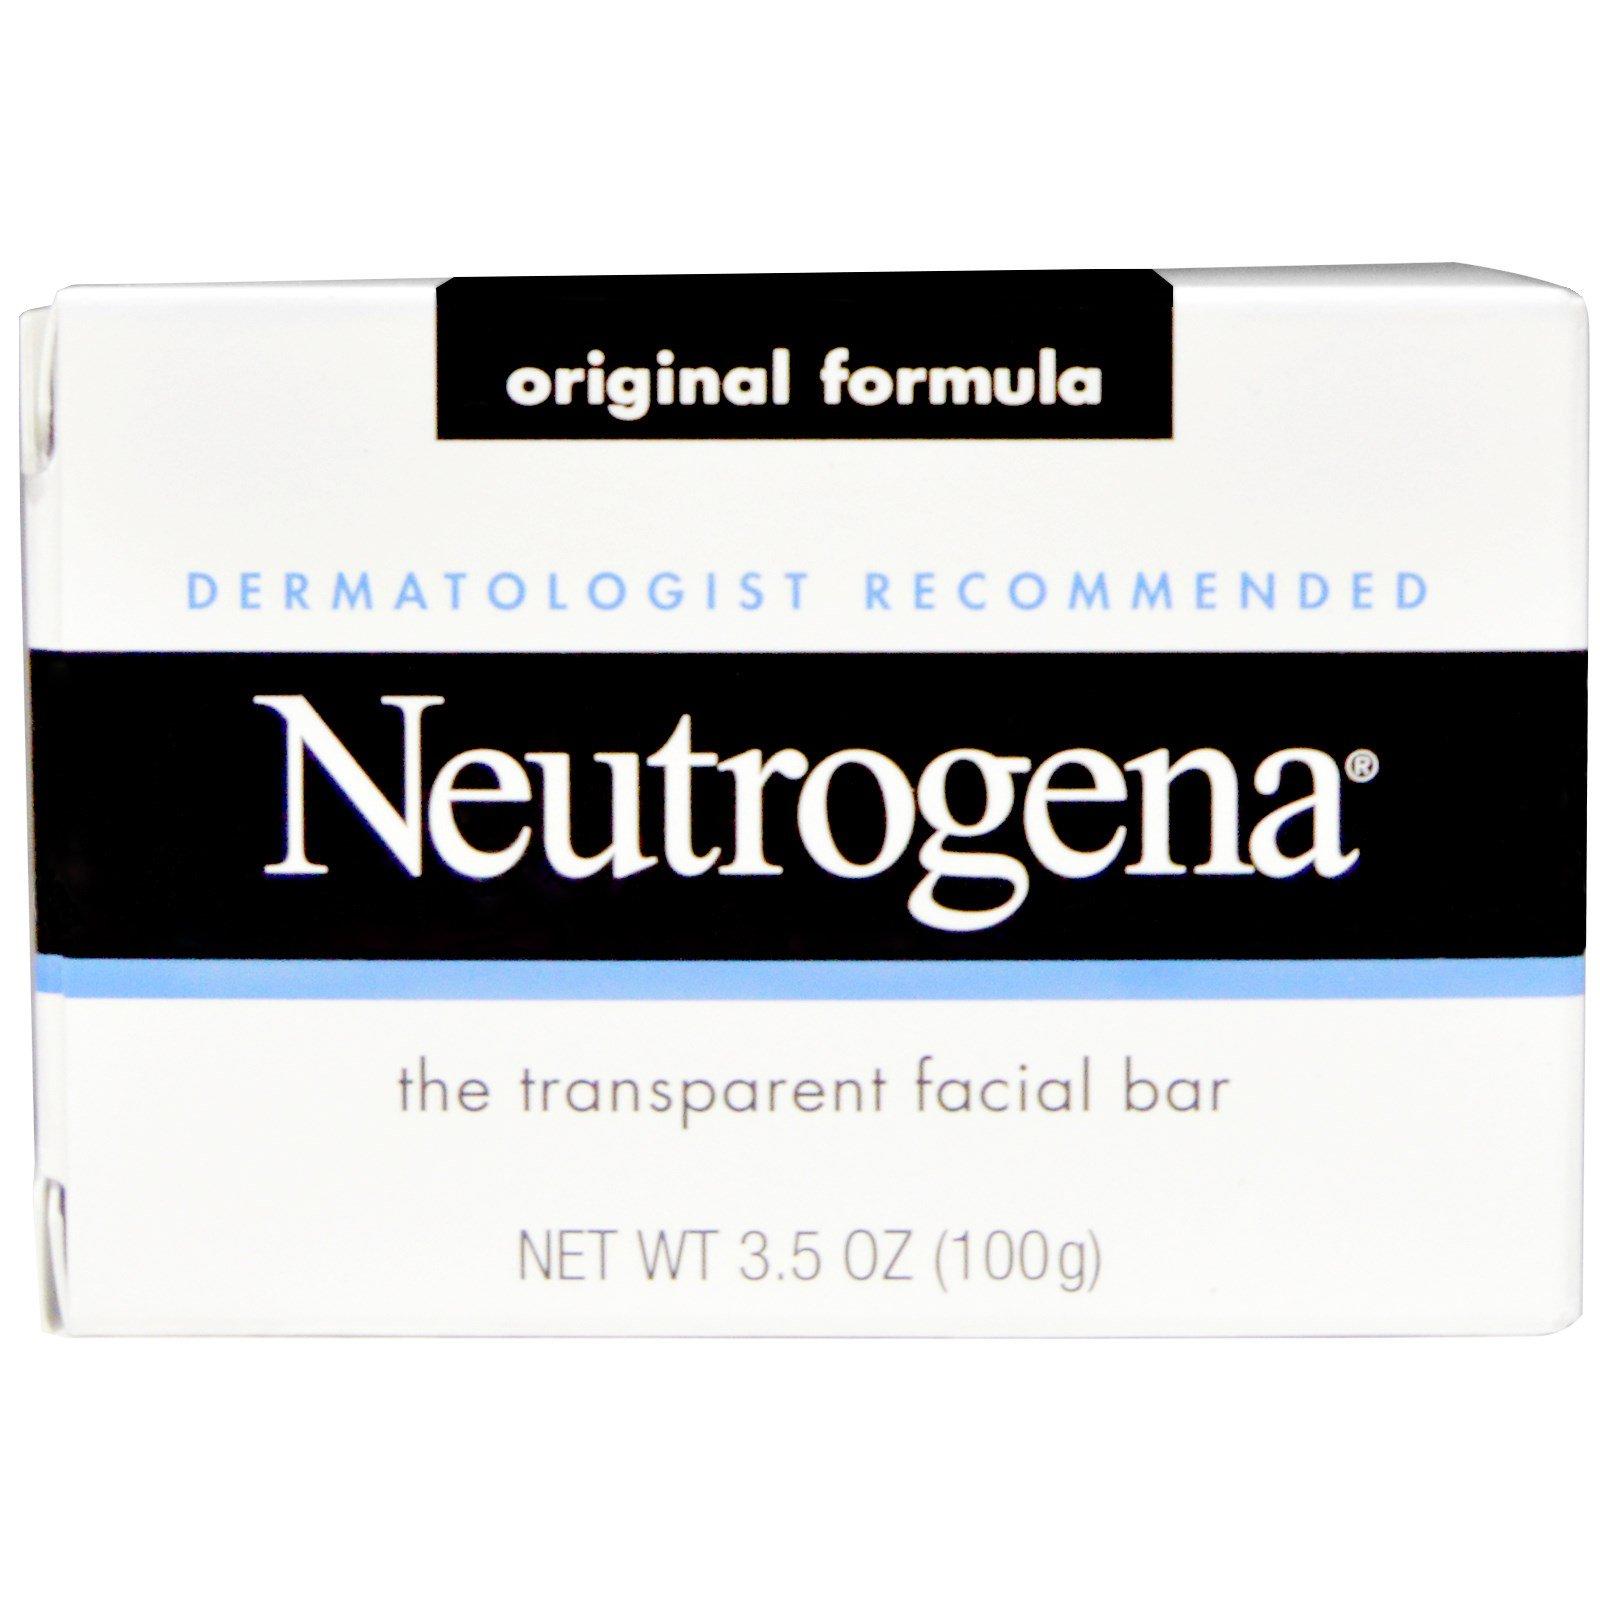 Neutrogena facial bar ingredients